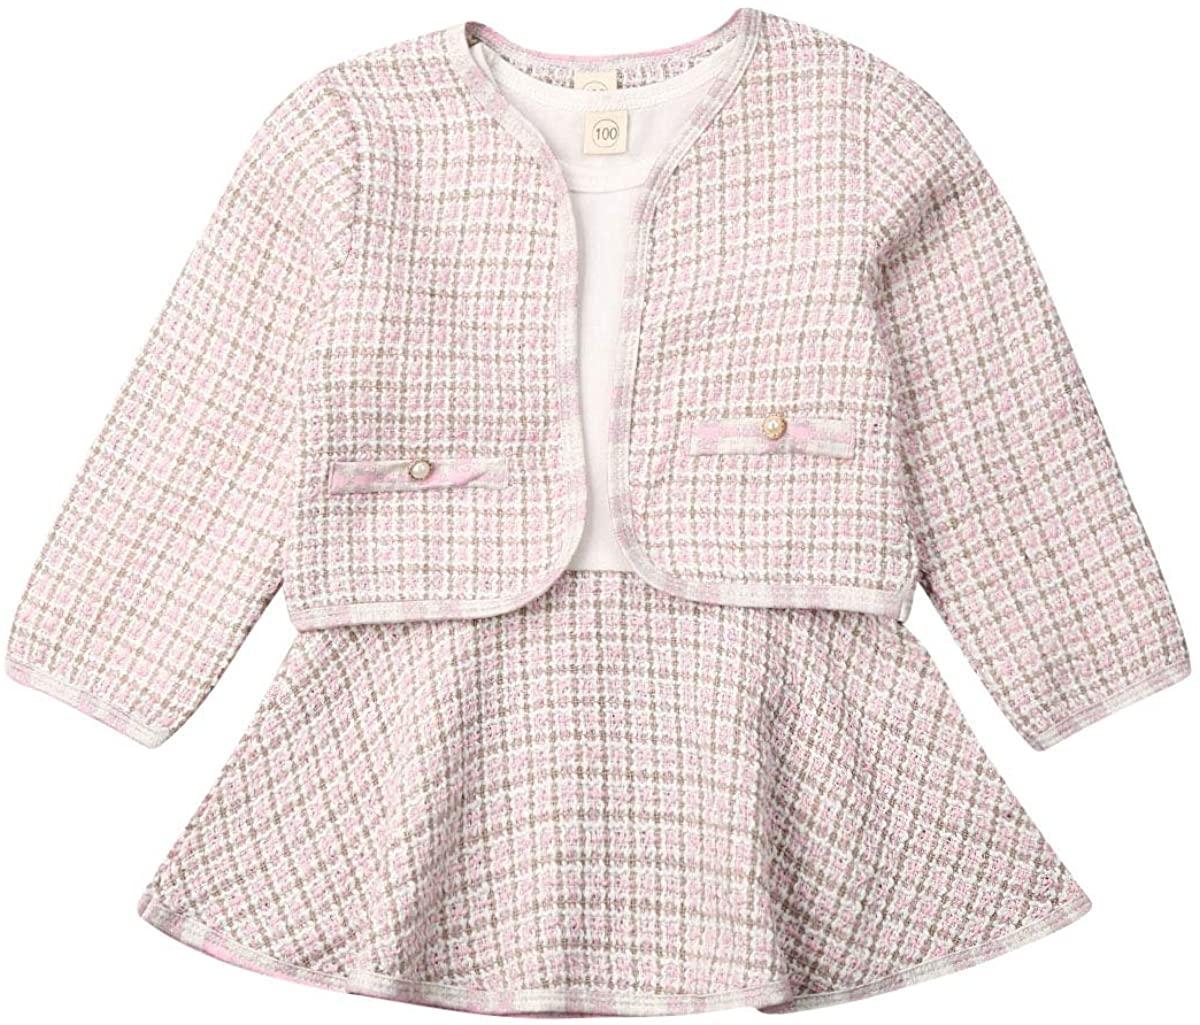 Toddler Baby Girl Plaid Skirt Set Long Sleeve Jacket Coat Tops + Dress Stitching Skirt Party Clothes Set